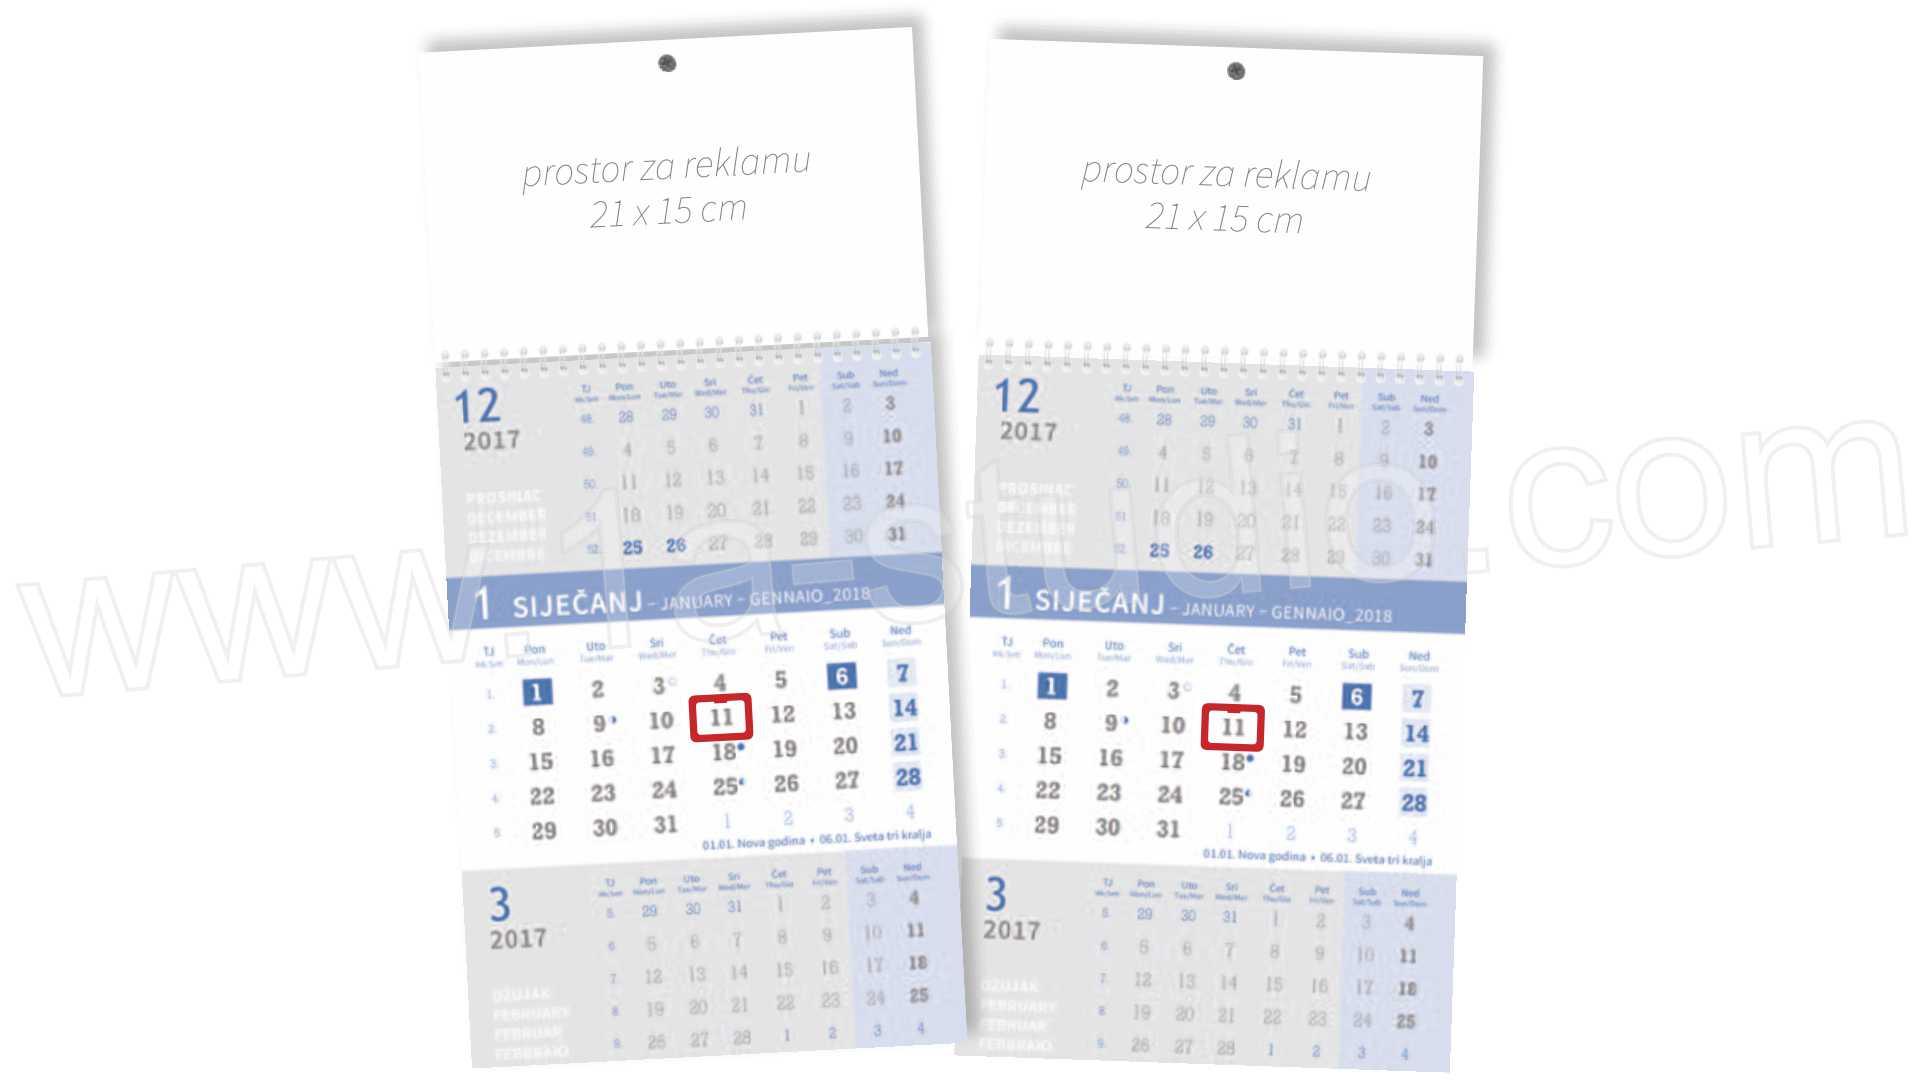 trodjelni Kalendar